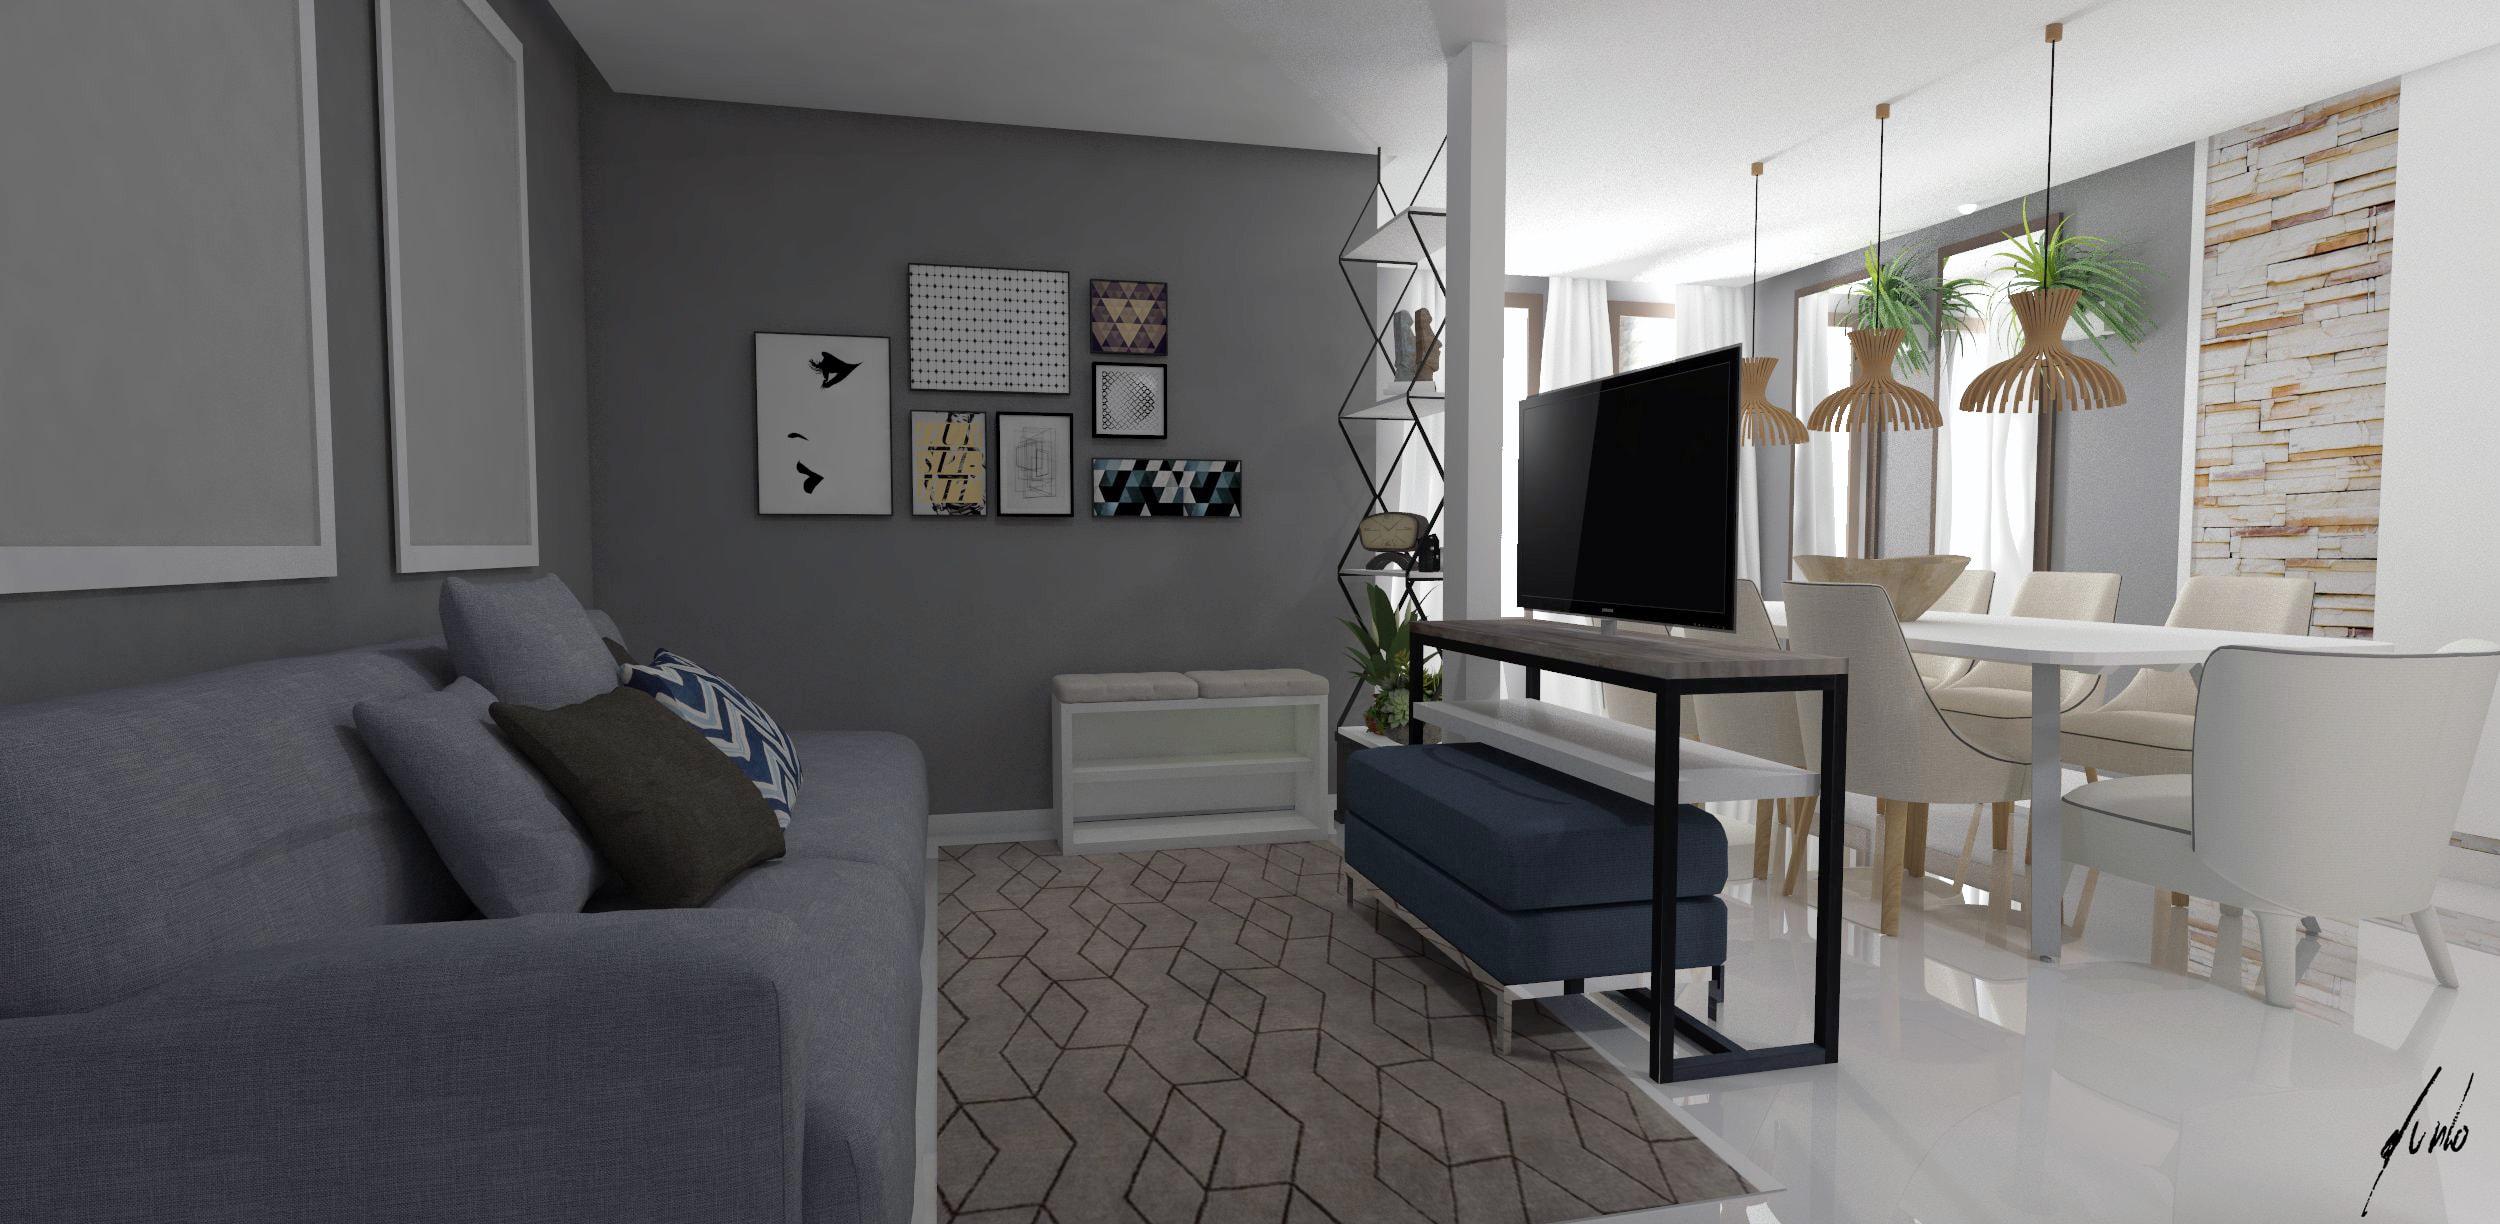 Salas de estar murilo zadulski interiores designer de - Casas modernas interiores ...